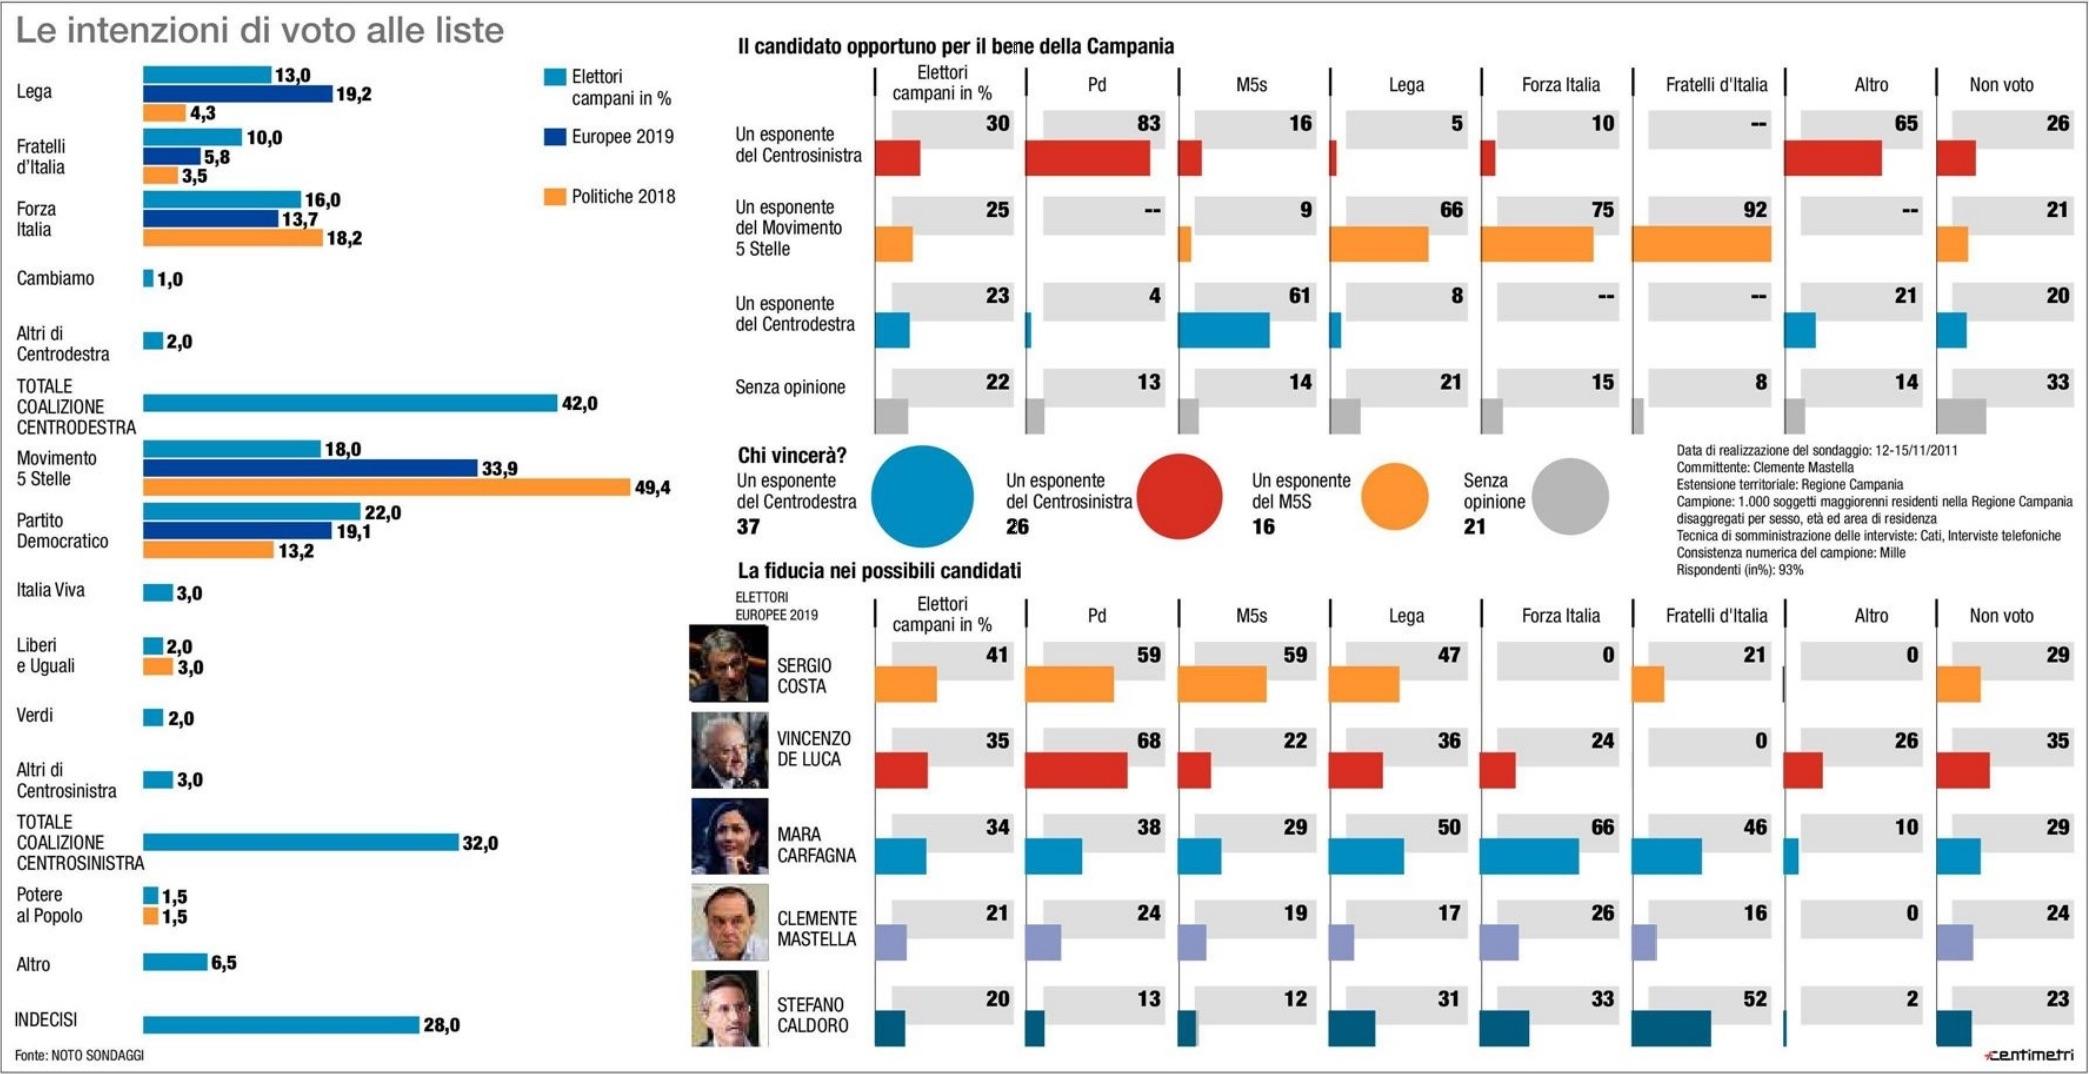 Sondaggi elettorali Campania: centrodestra avanti di 10 punti